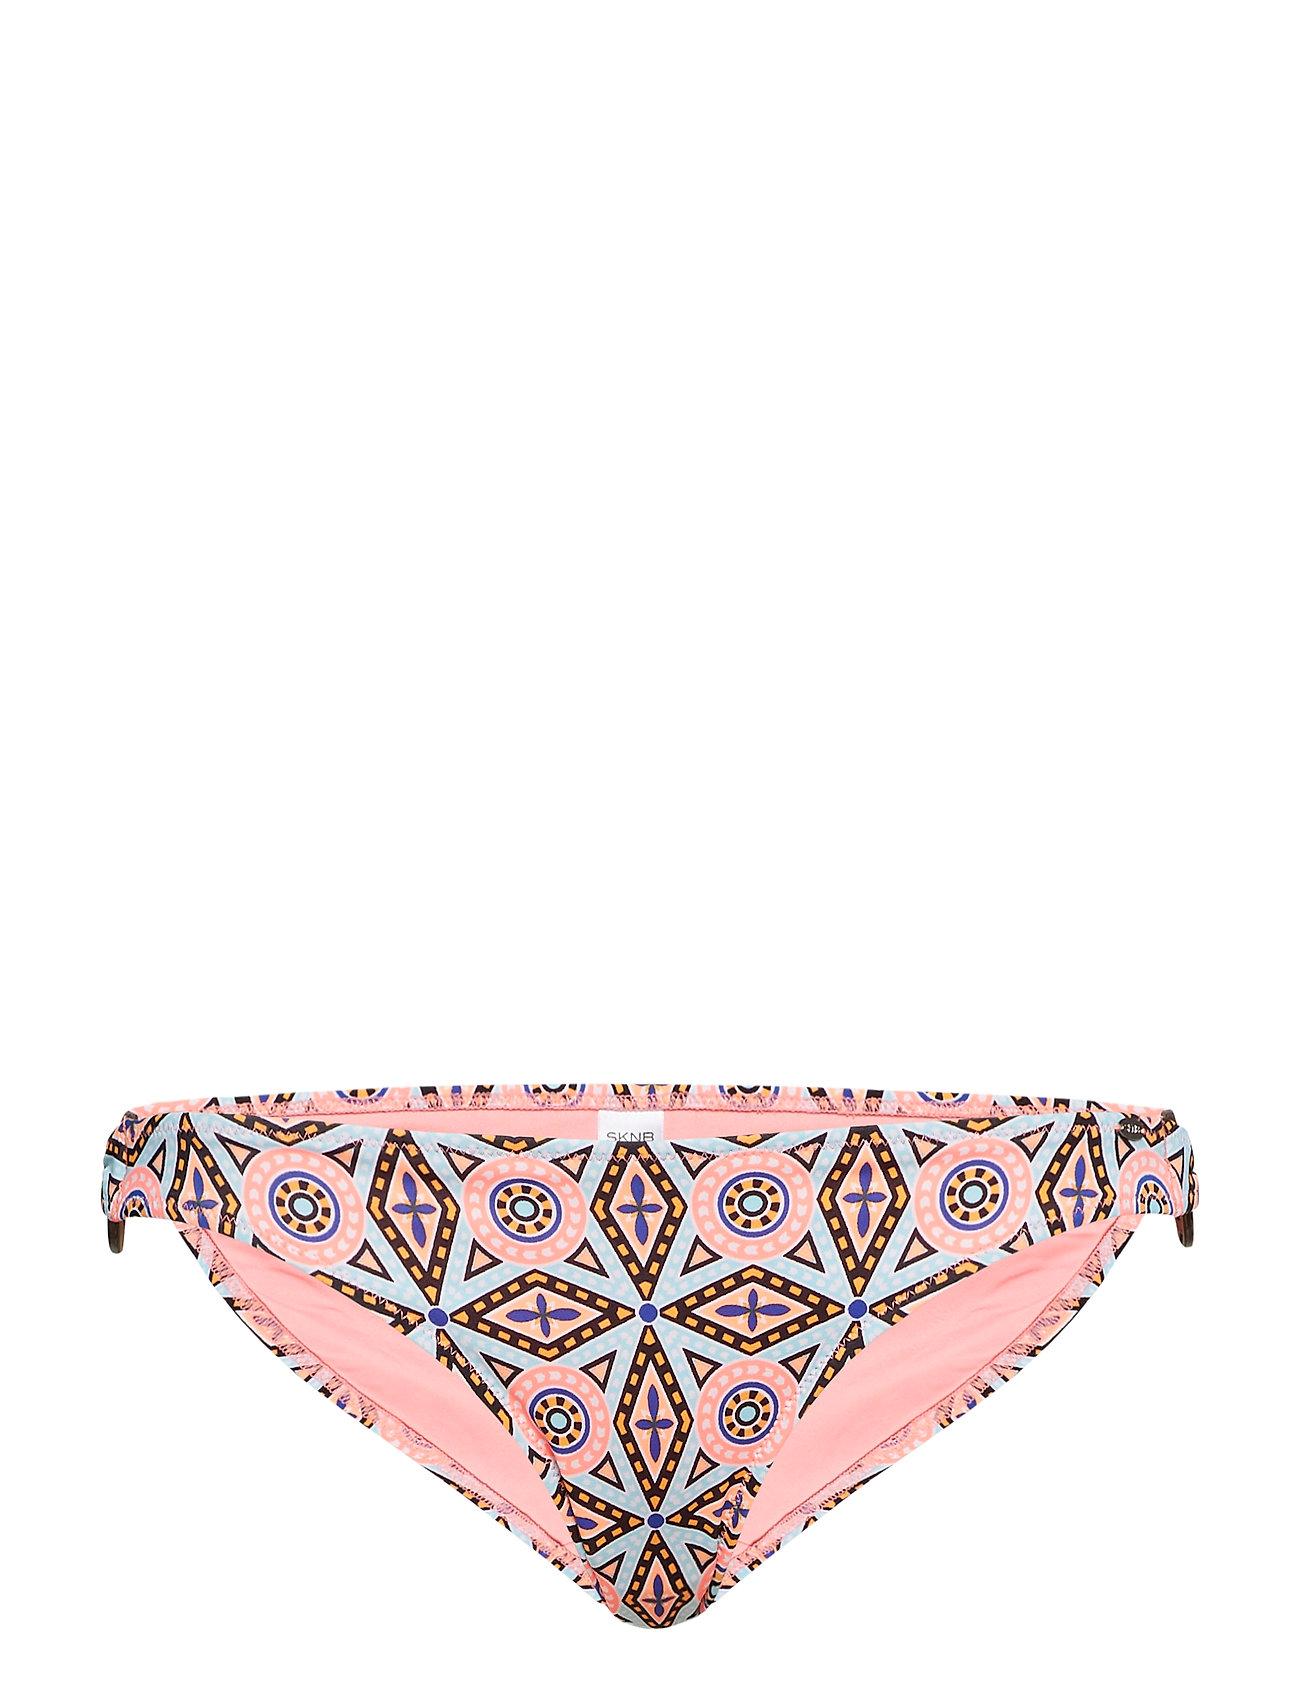 Skiny L. bikini briefs - ETHNIC CRYSTALS